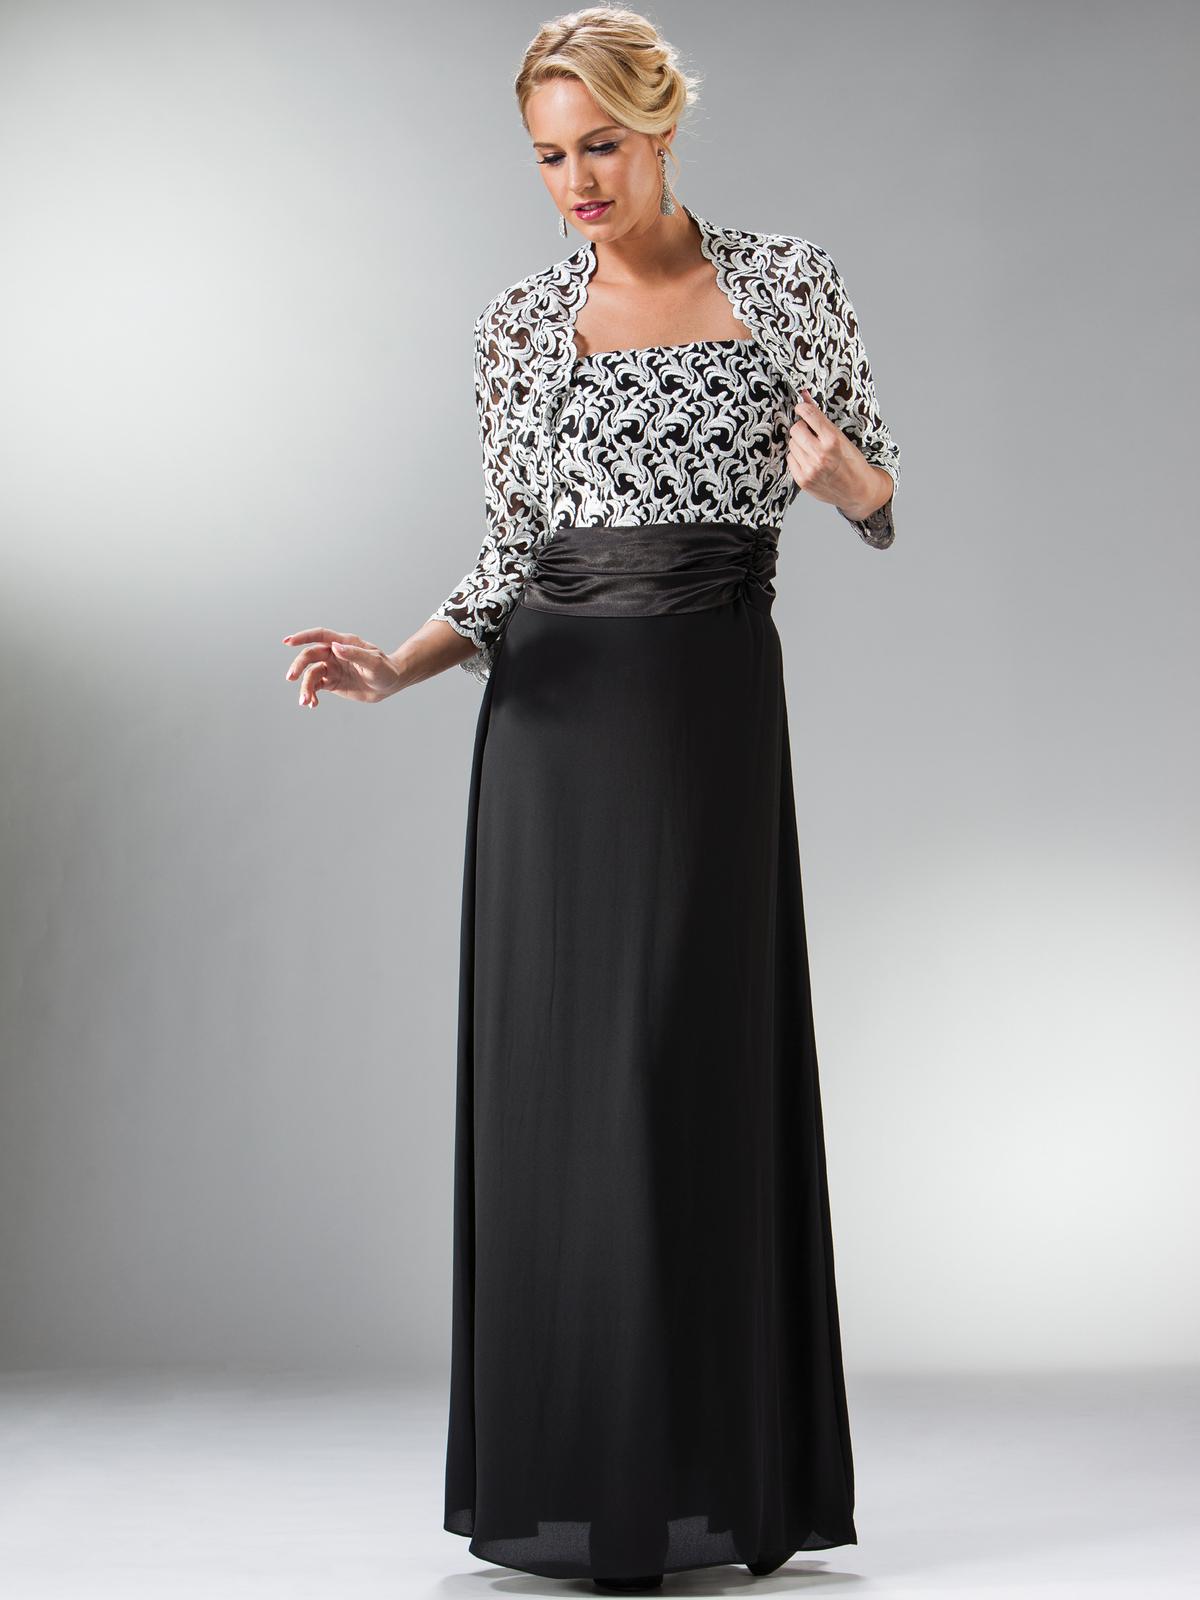 Black MOB Evening Dress with Lace Bolero   Sung Boutique L.A.